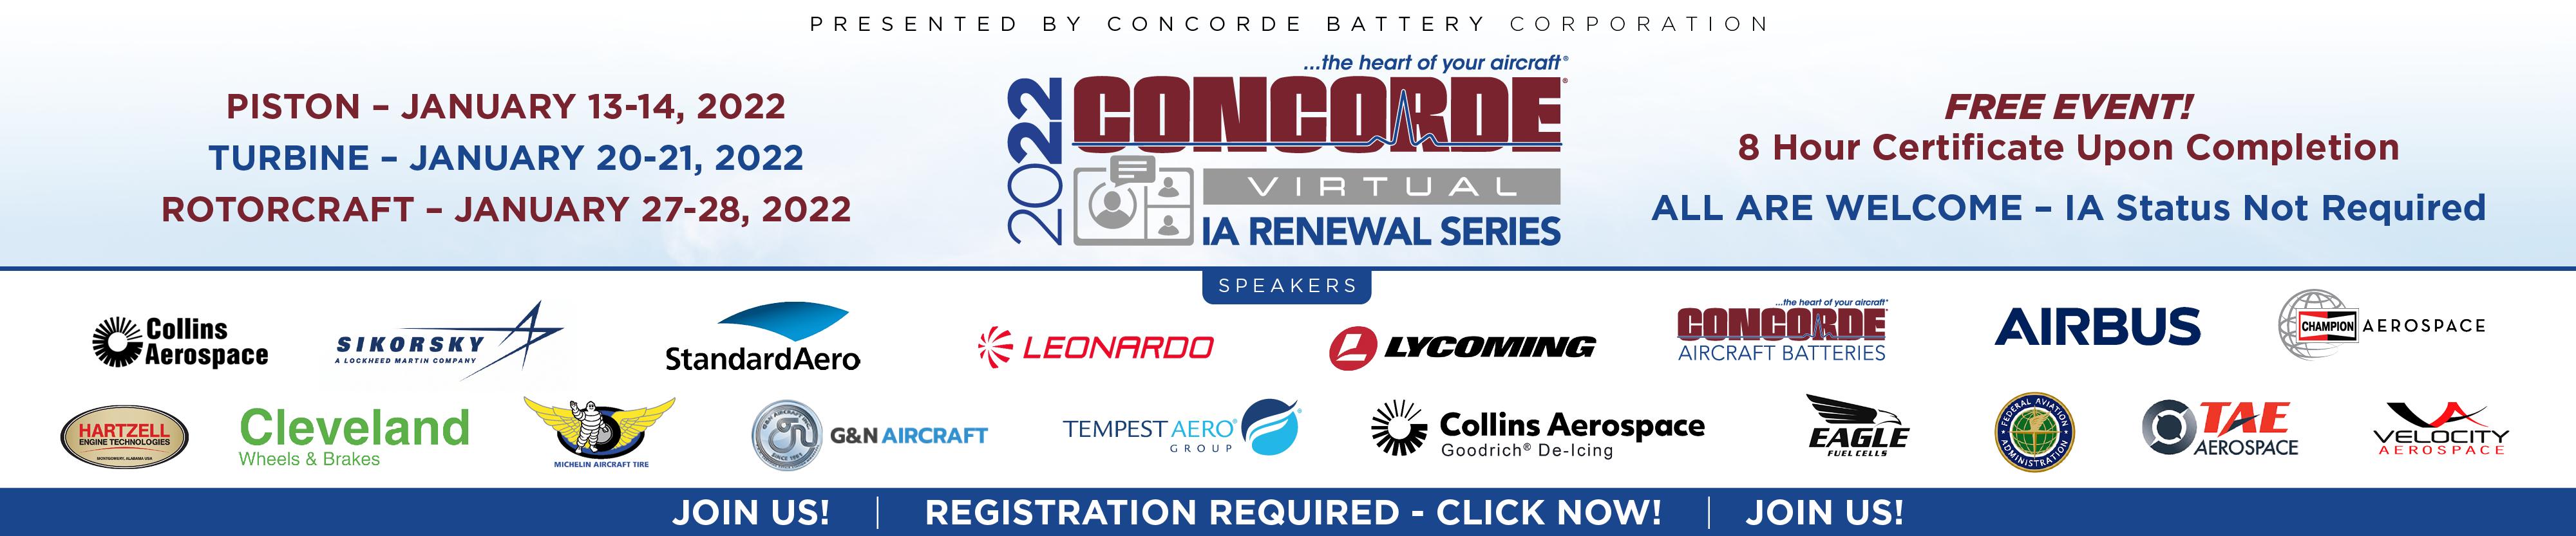 2022_Concorde_Battery_Virtual_IA_Renewal_Series__WebHeader_1920x400_V6_150